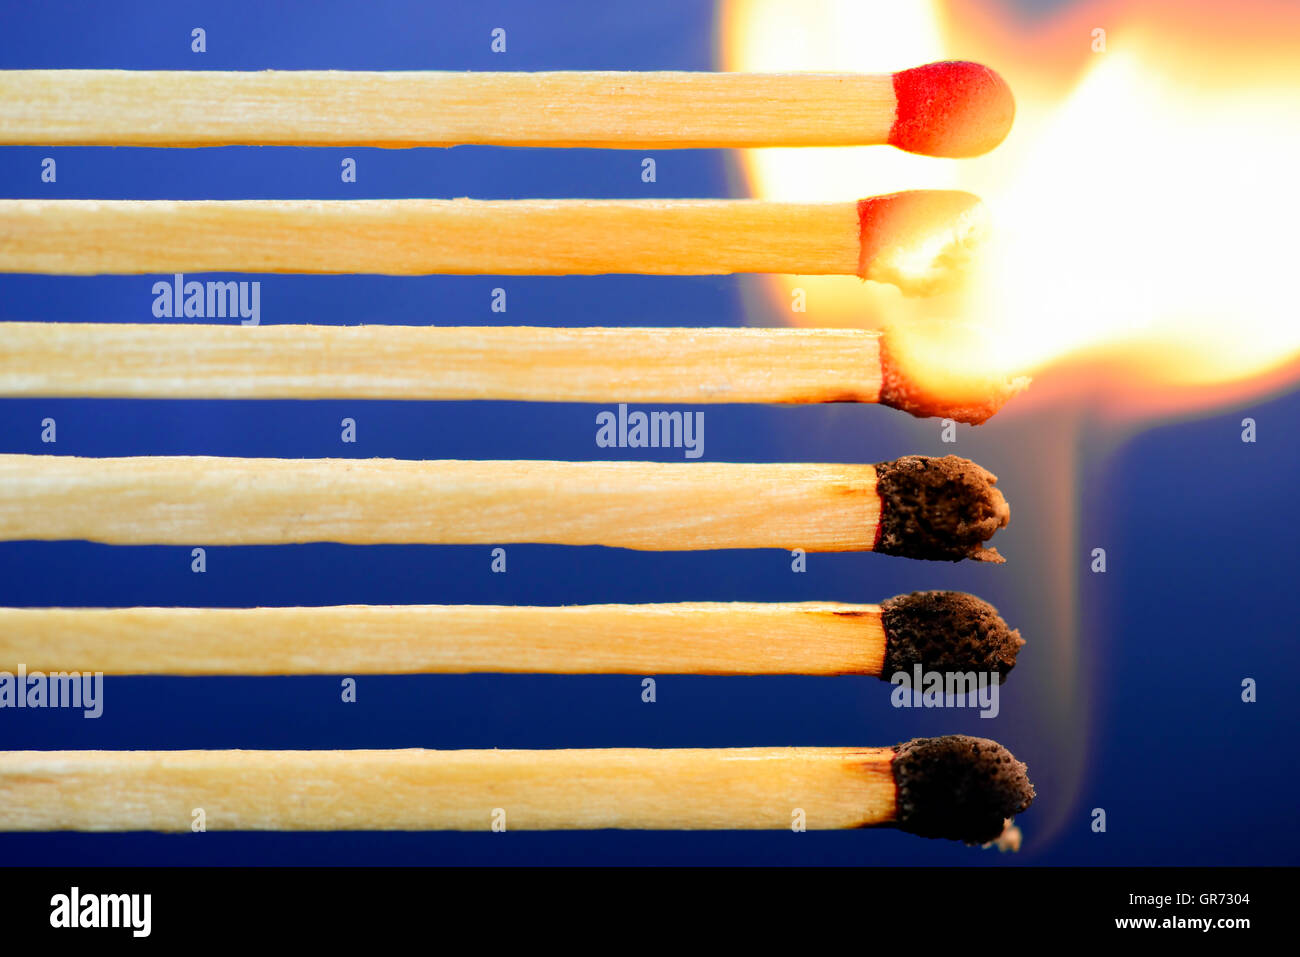 Burning Matches, Domino Effect - Stock Image